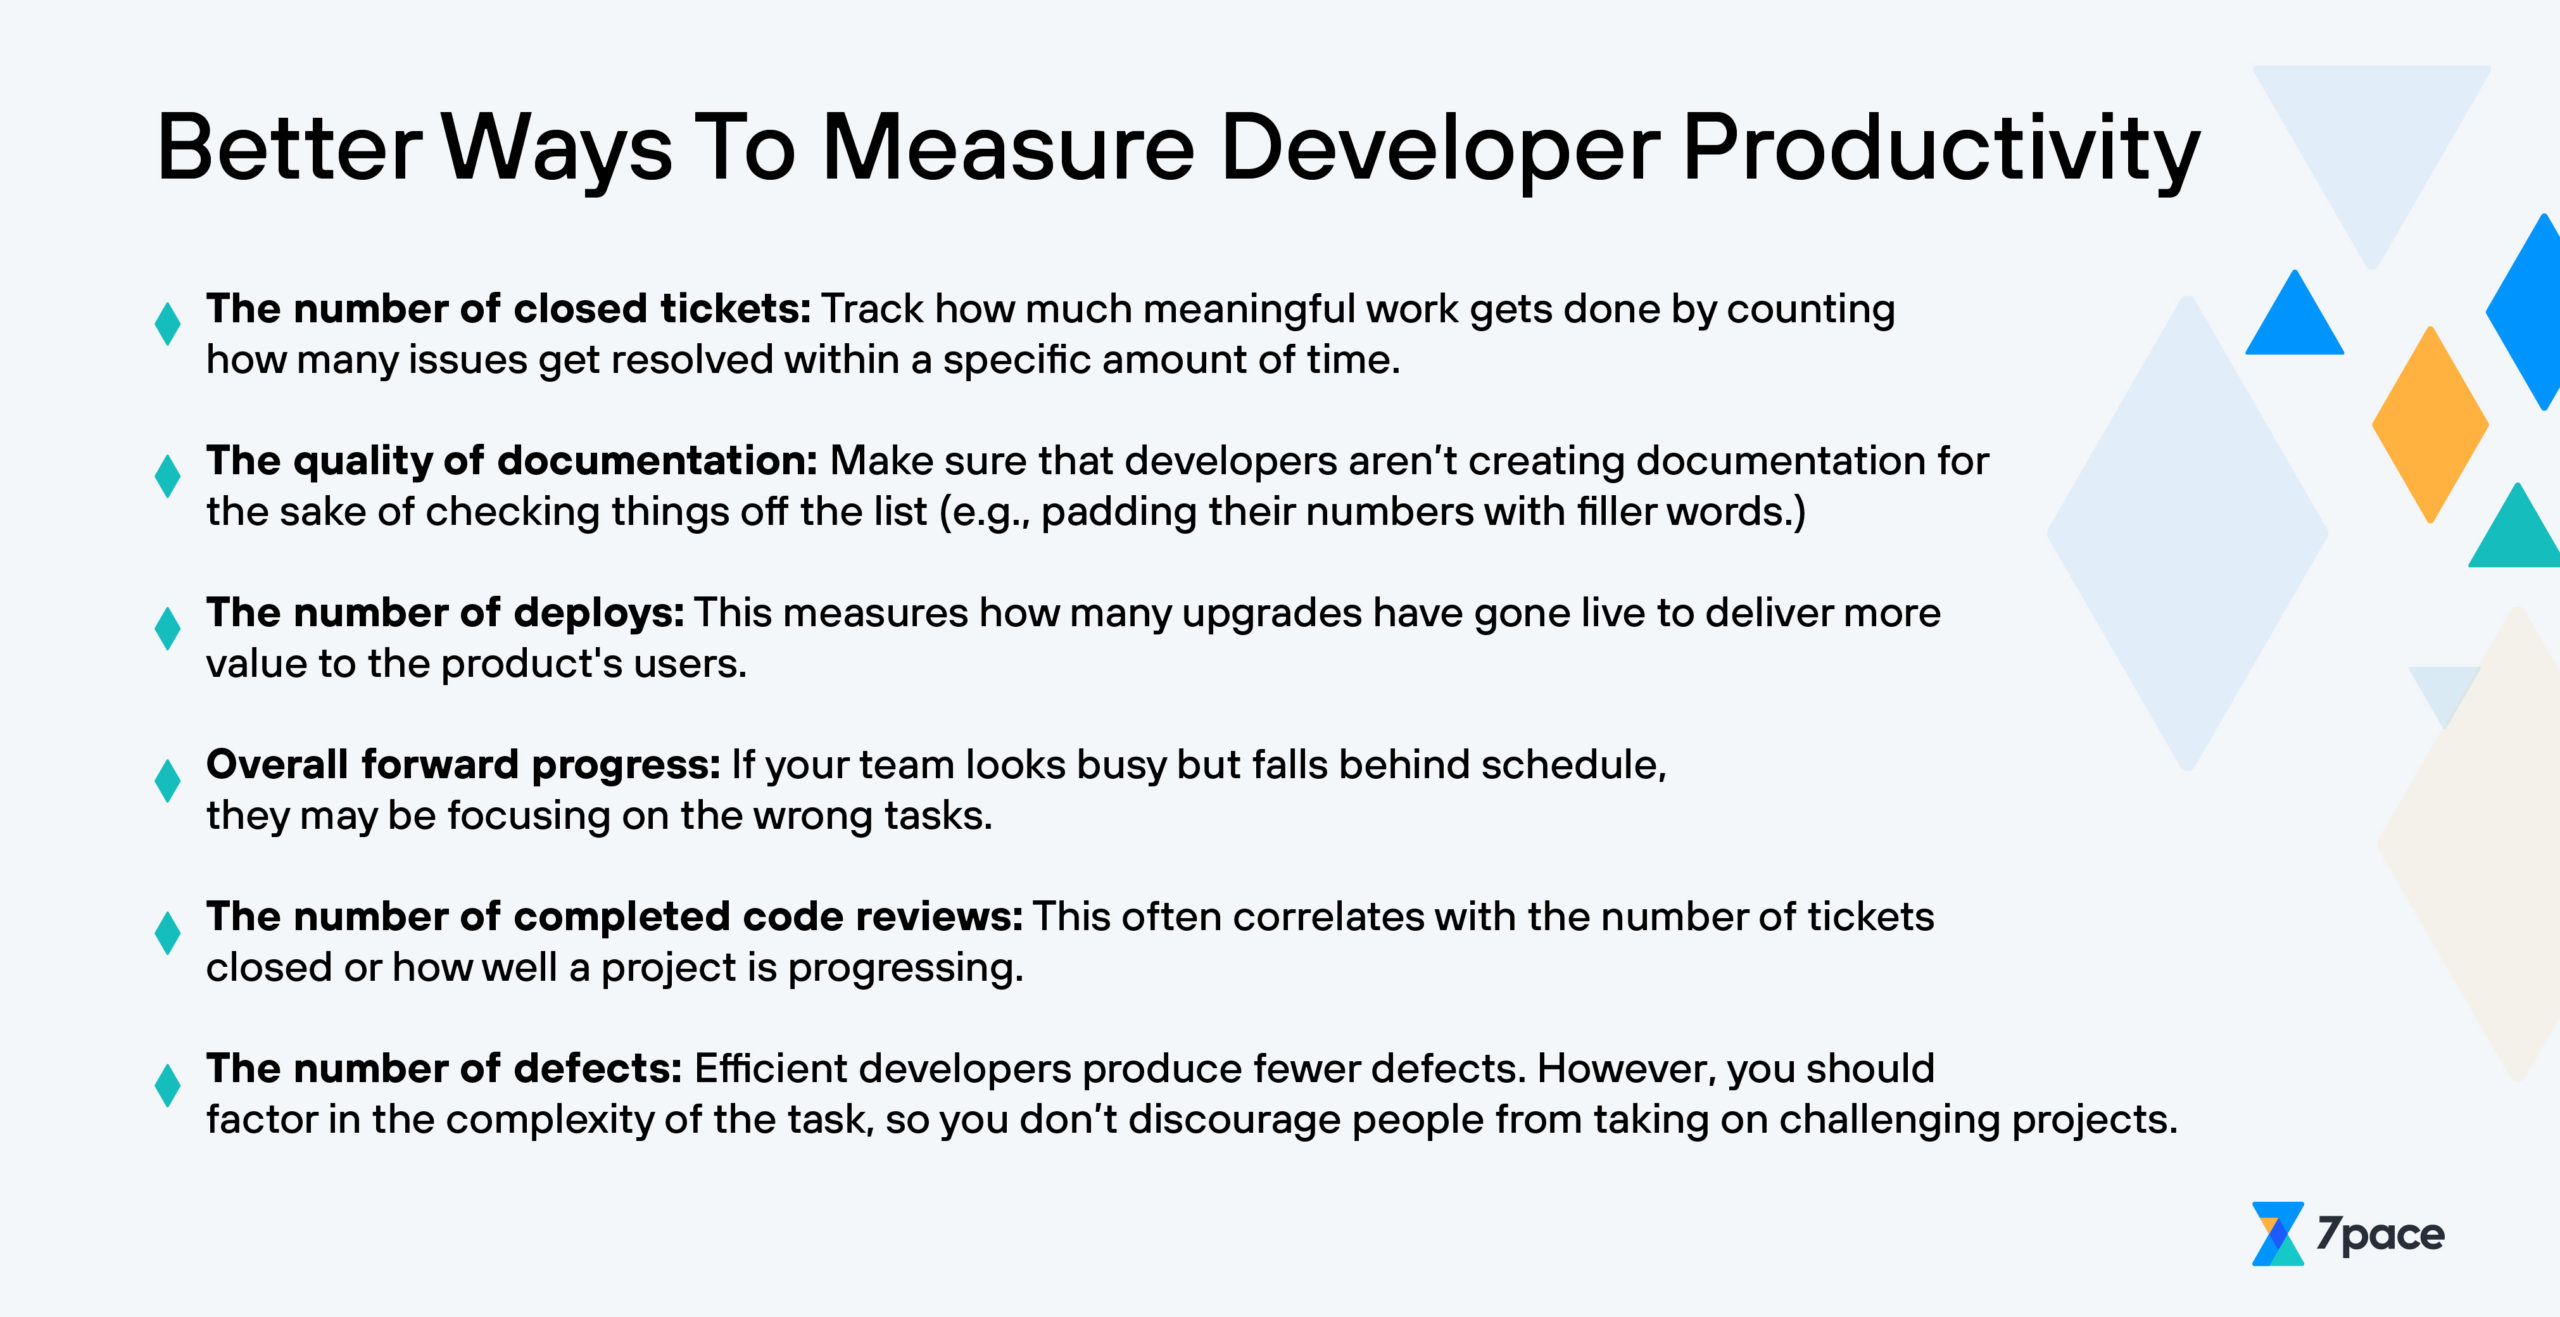 better ways to measure developer productivity